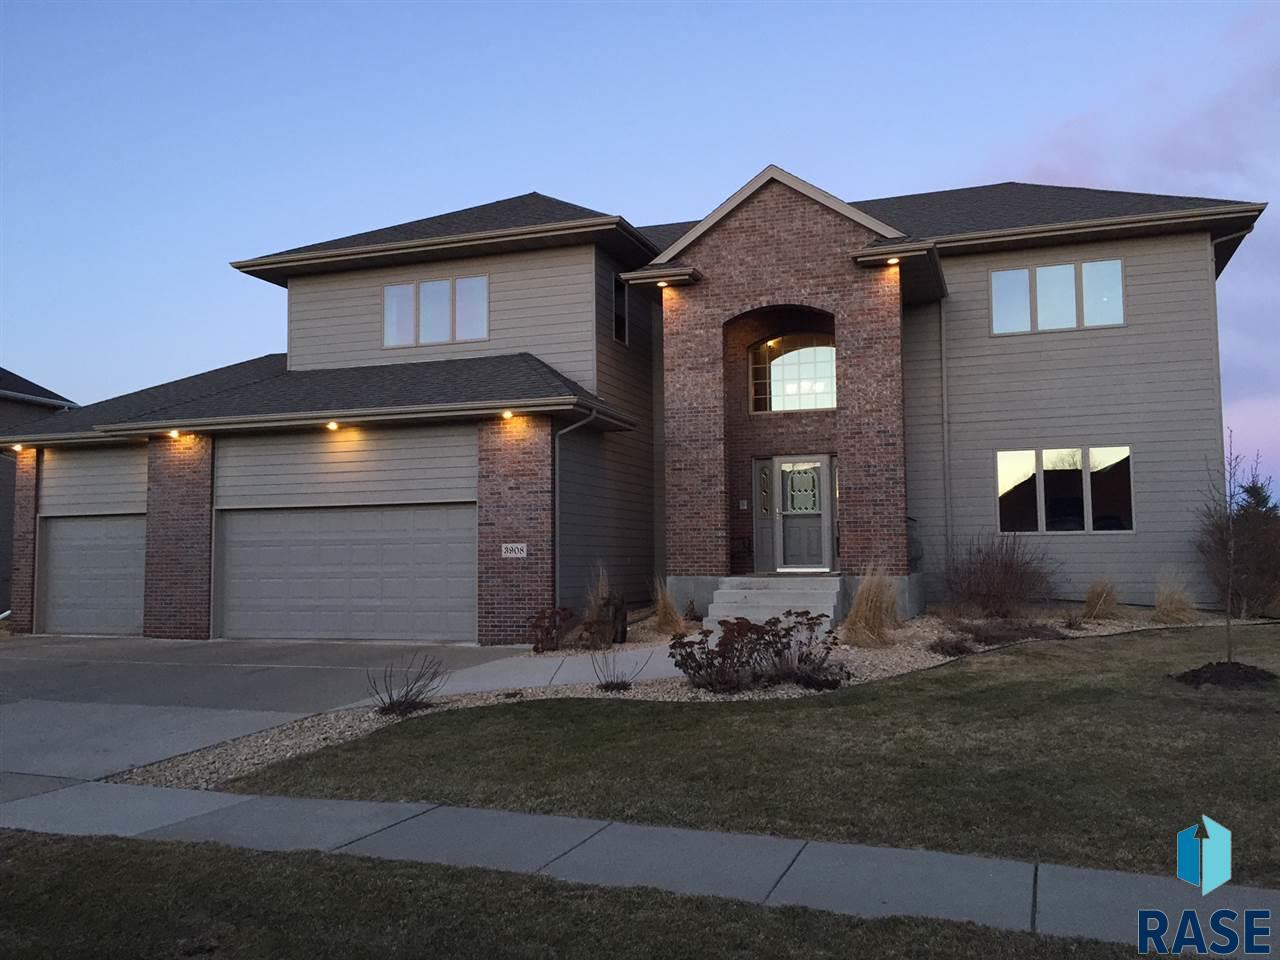 3908 S Pillsberry Ave, Sioux Falls, SD 57103